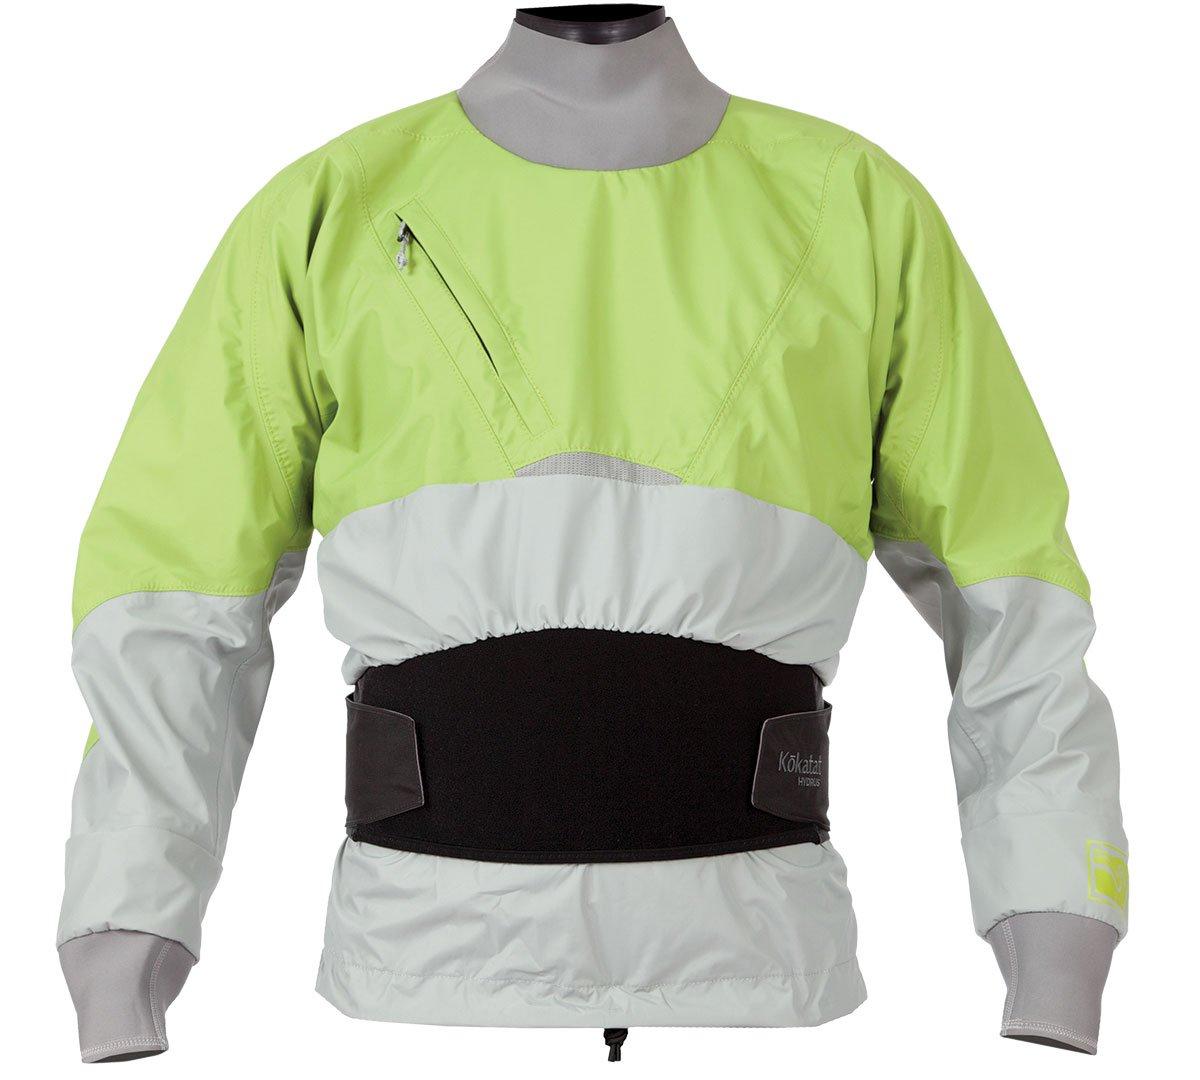 Kokatat Hydrus 3l Stoke Drytop – Men 's Small 地衣類 B0797NPZQP